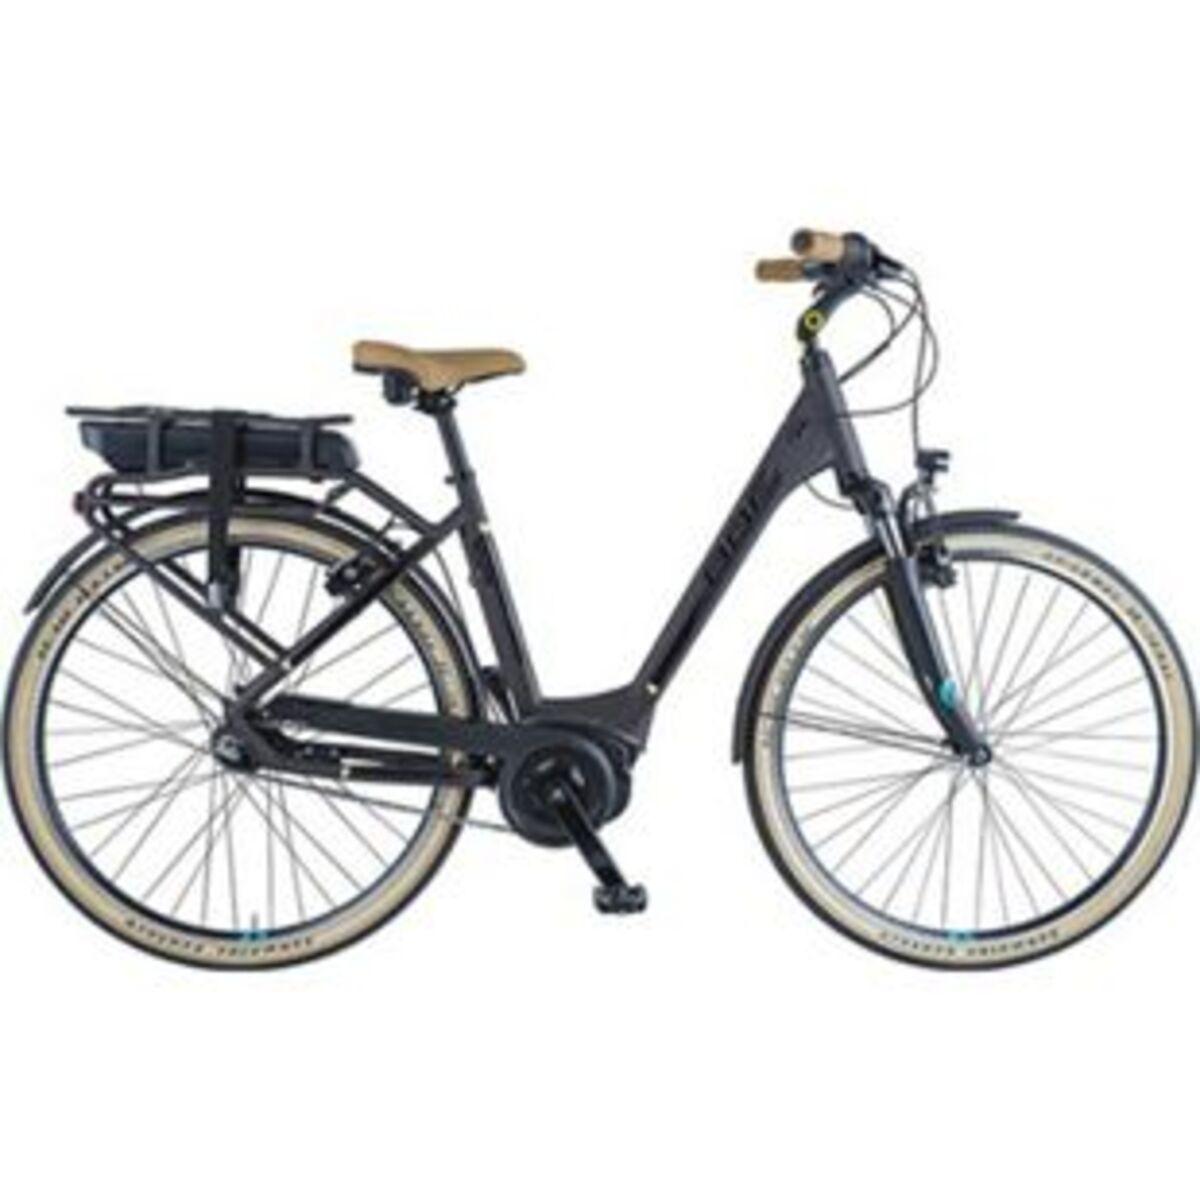 Bild 2 von BBF Madrid 700c E-Bike Damenrad Stadtrad 28 Zoll Pedelec Elektrofahrrad Citybike StVZO... 50 cm, braun